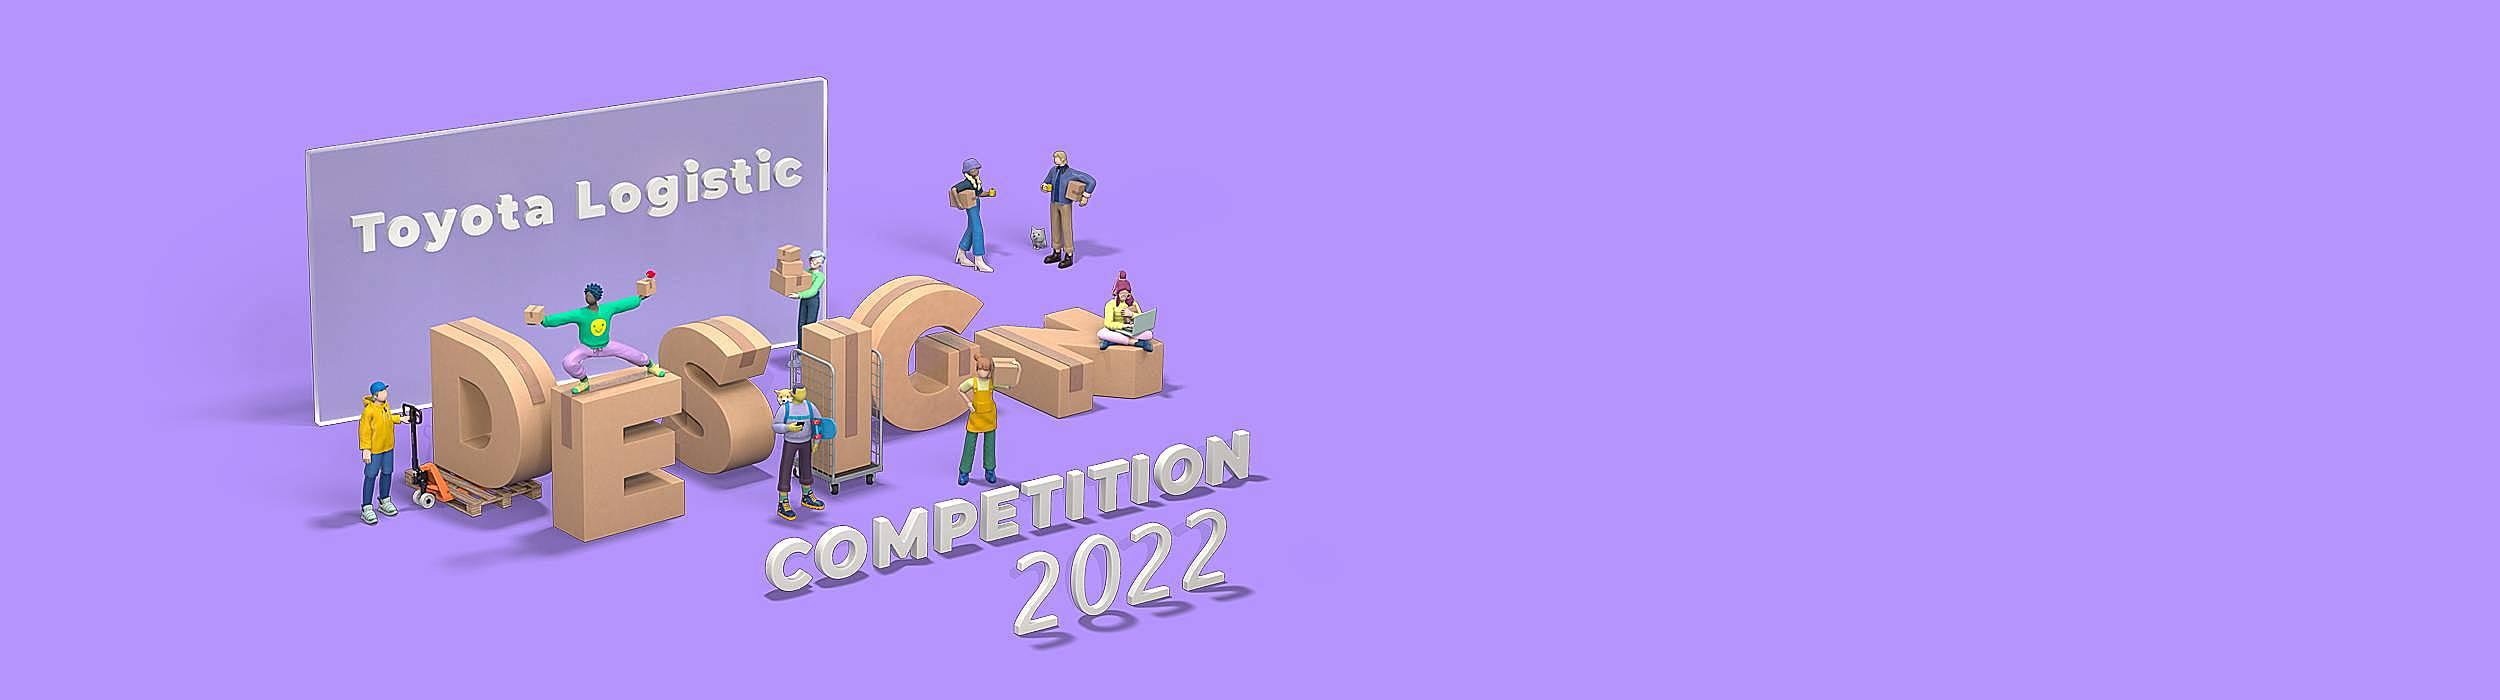 Toyota Logistic Design Competition 2022 - Micro Logistics